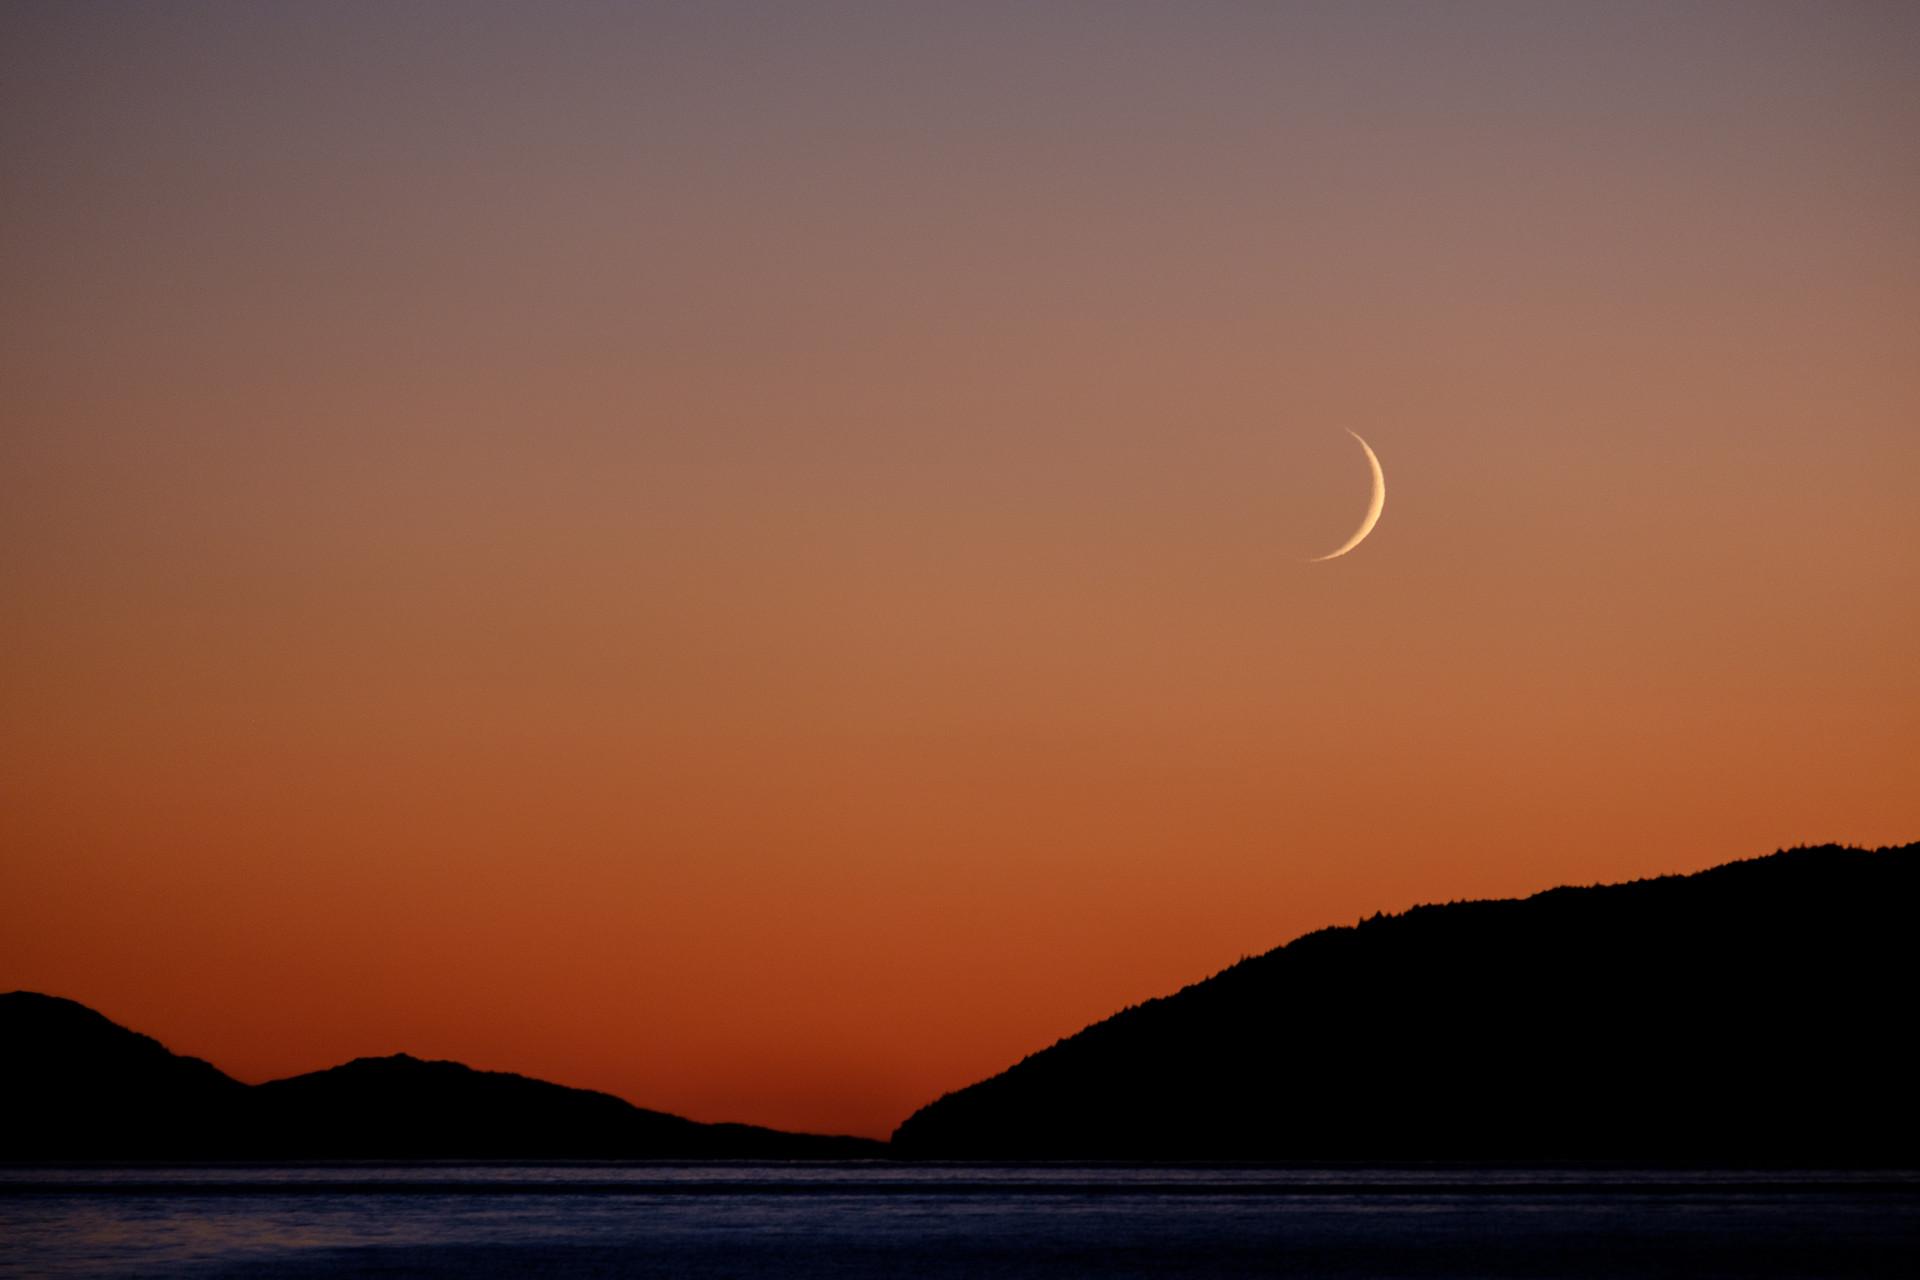 Moonrise, sunset.